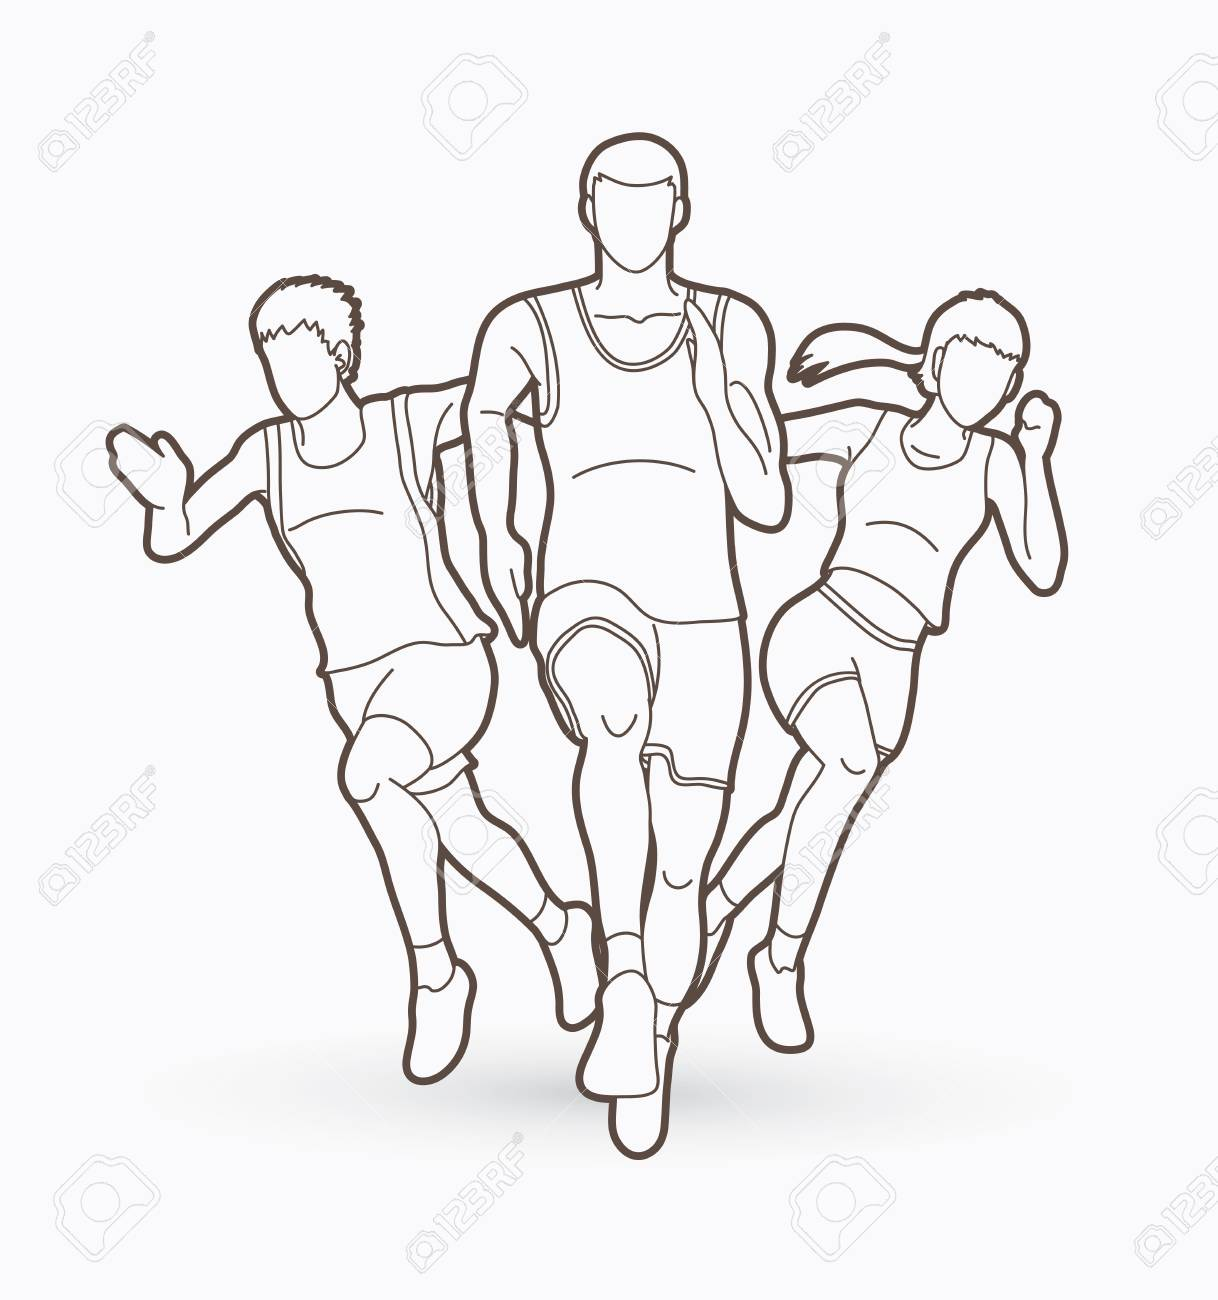 People Run Runner Marathon Running Team Work Group Of